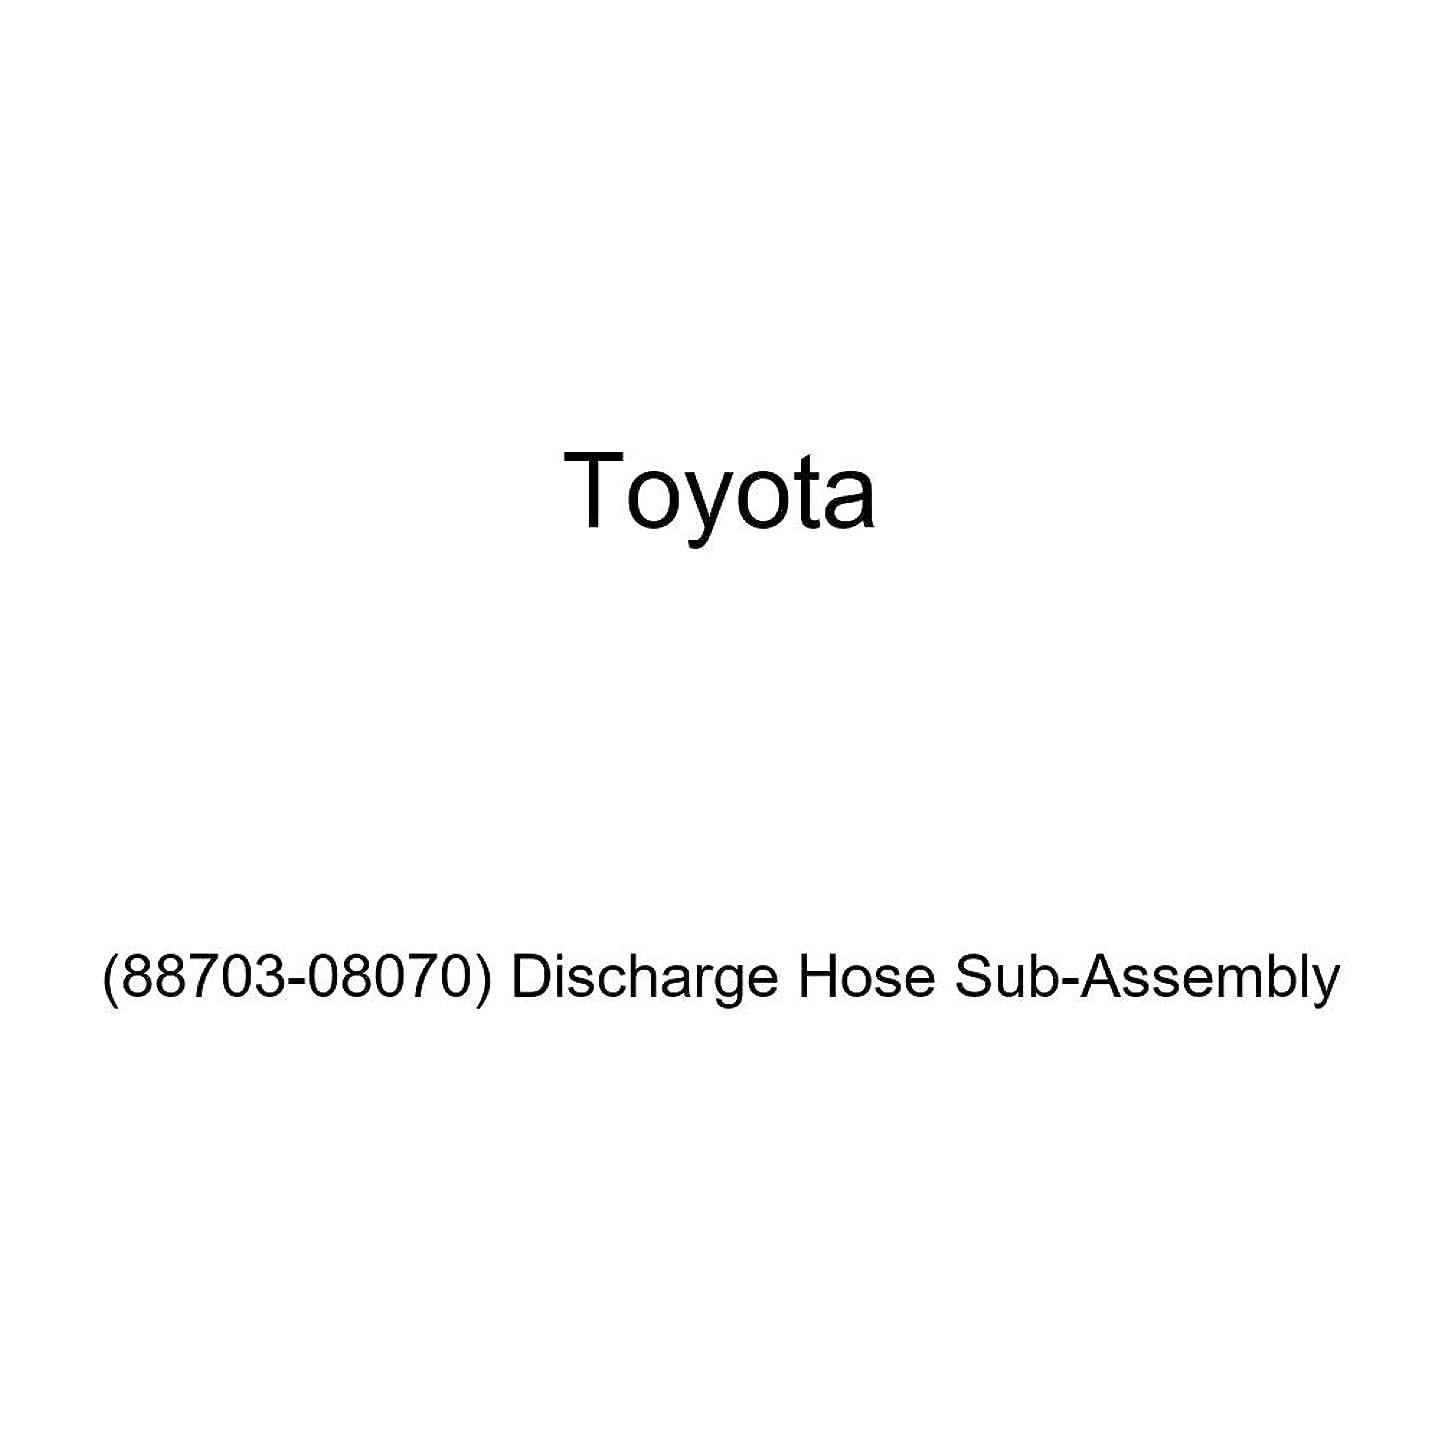 Genuine Toyota (88703-08070) Discharge Hose Sub-Assembly